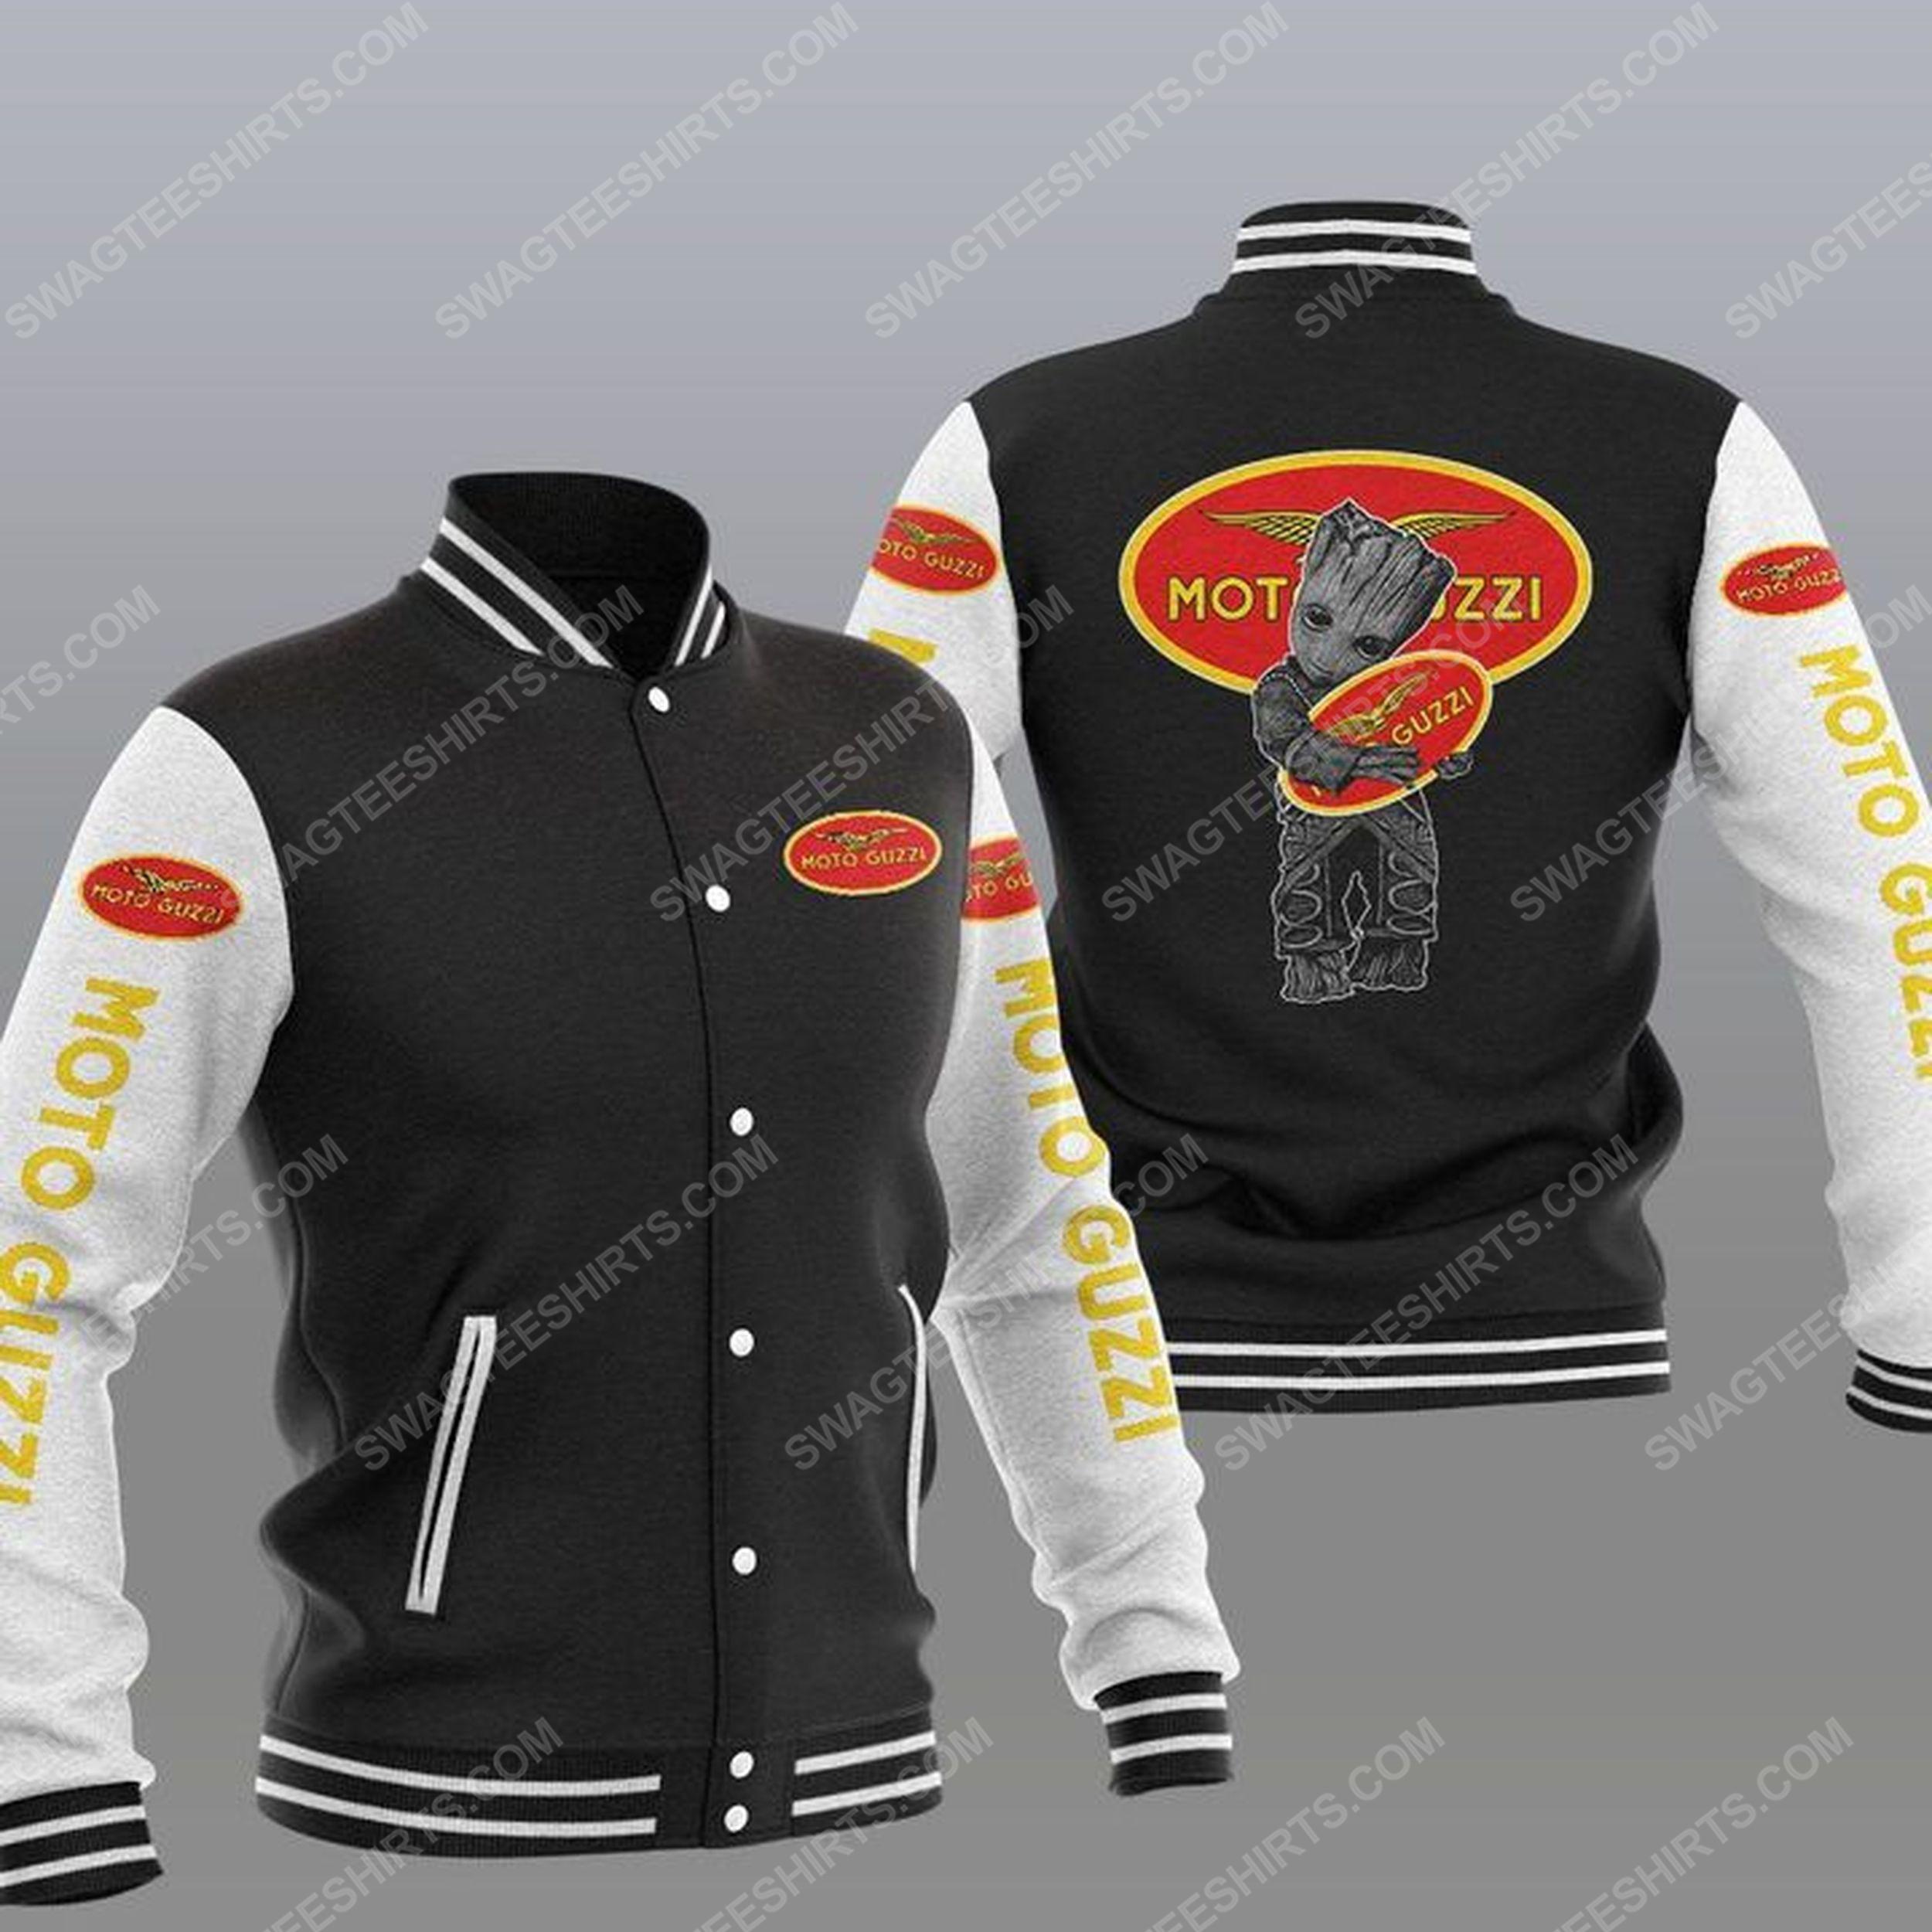 Baby groot and moto guzzi all over print baseball jacket - black 1